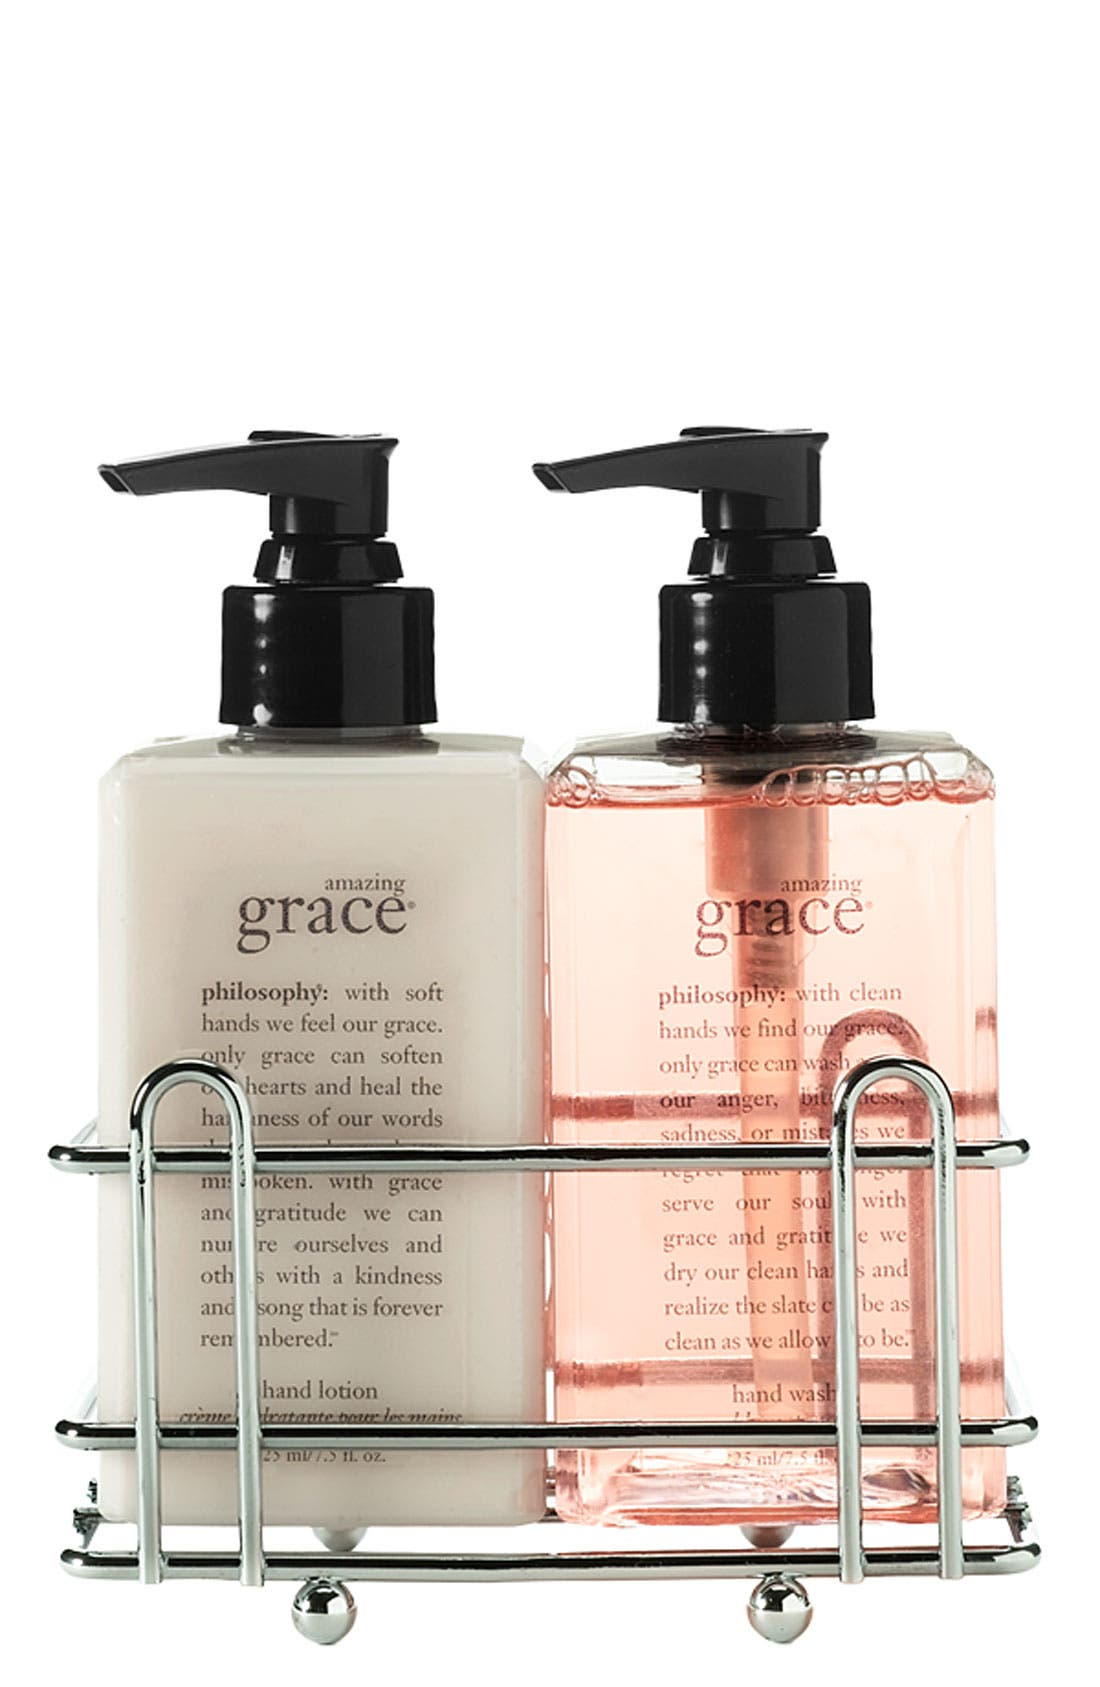 Alternate Image 1 Selected - philosophy 'amazing grace' hand wash & hand lotion set ($36 Value)